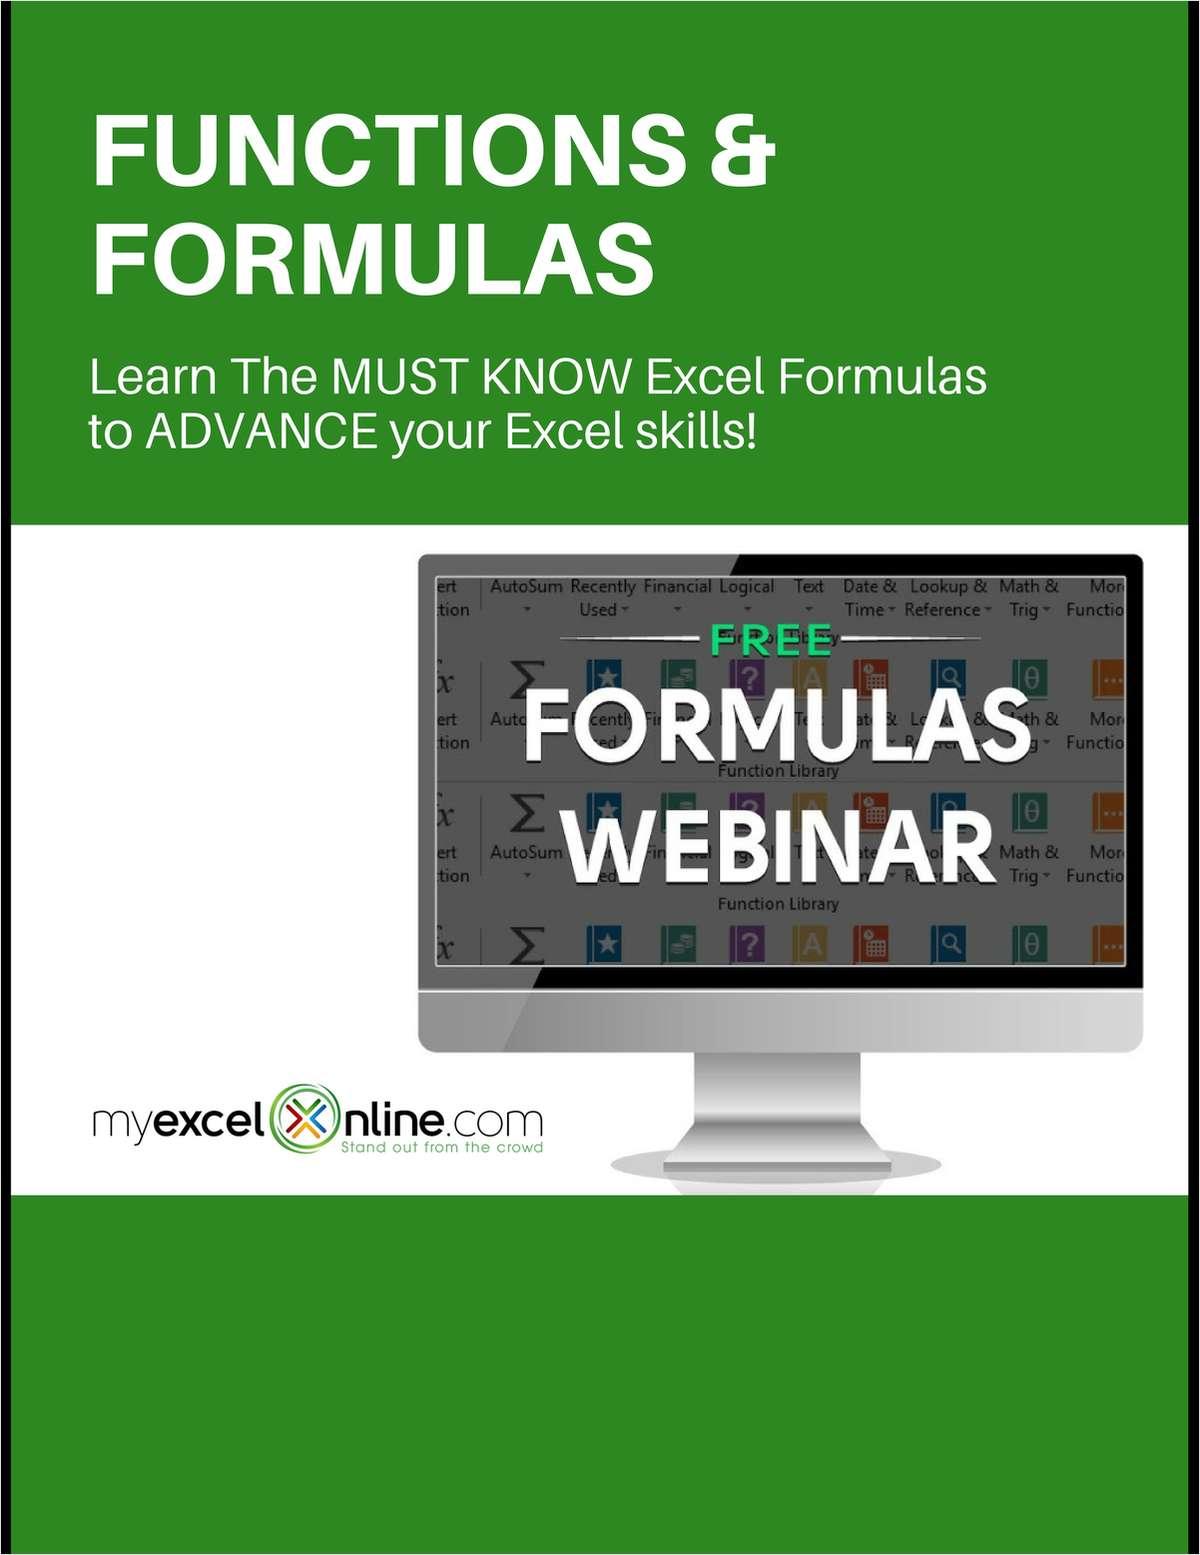 Functions & Formulas Training - Free Excel Webinar